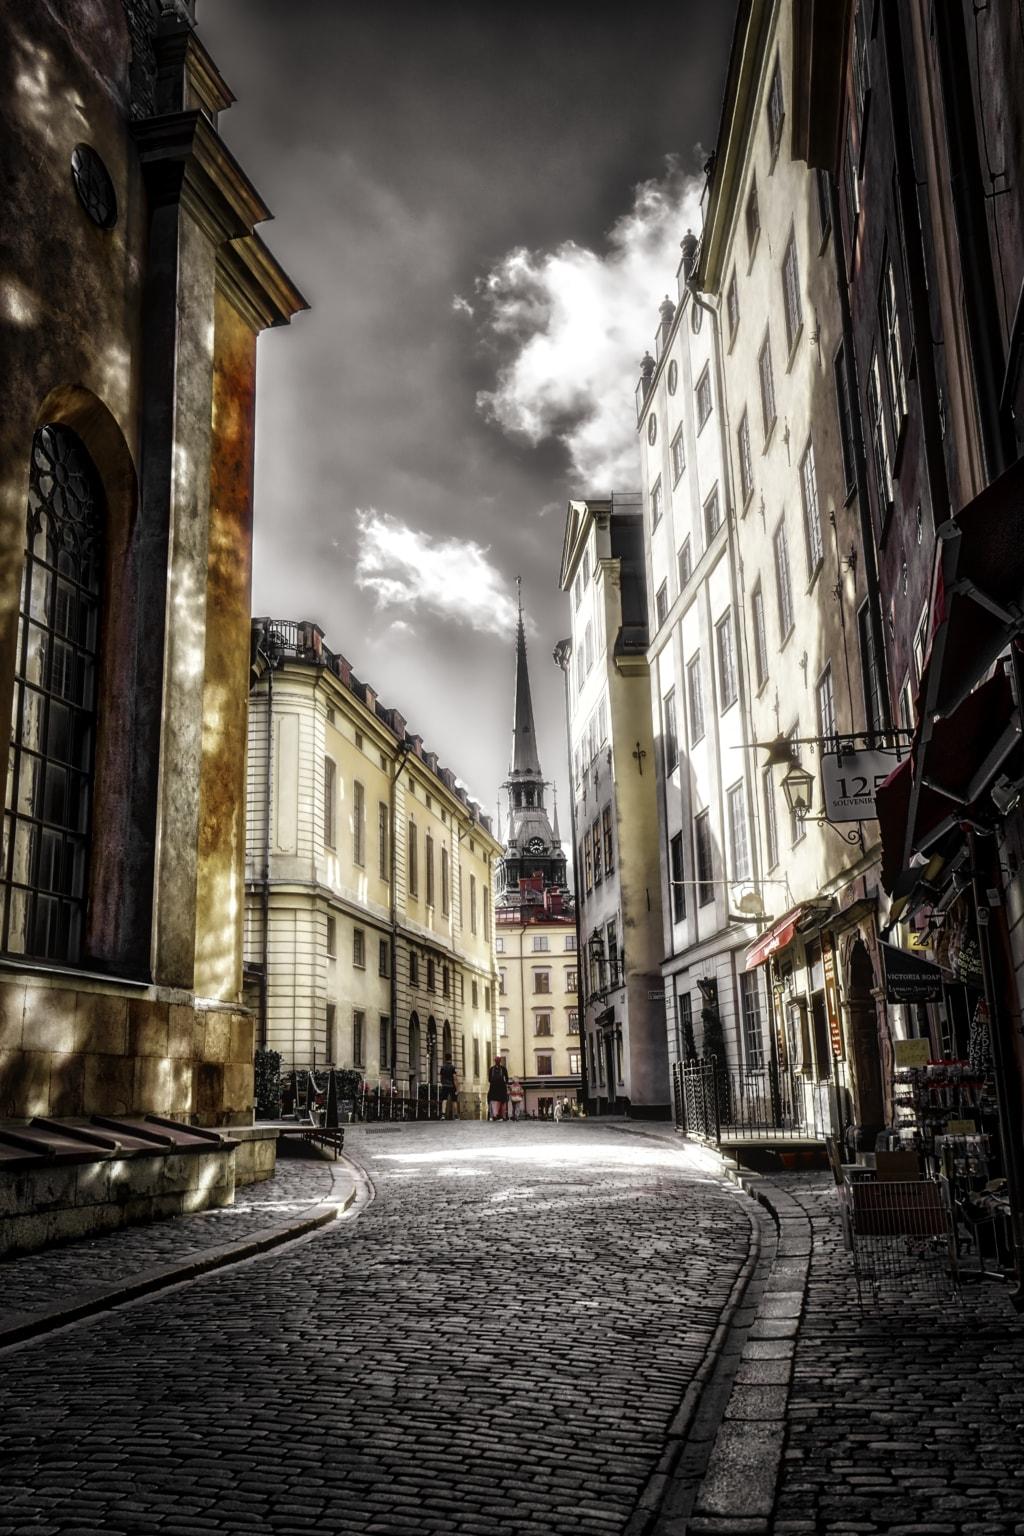 Streets of stockholm via Lars-Ove Törnebohm